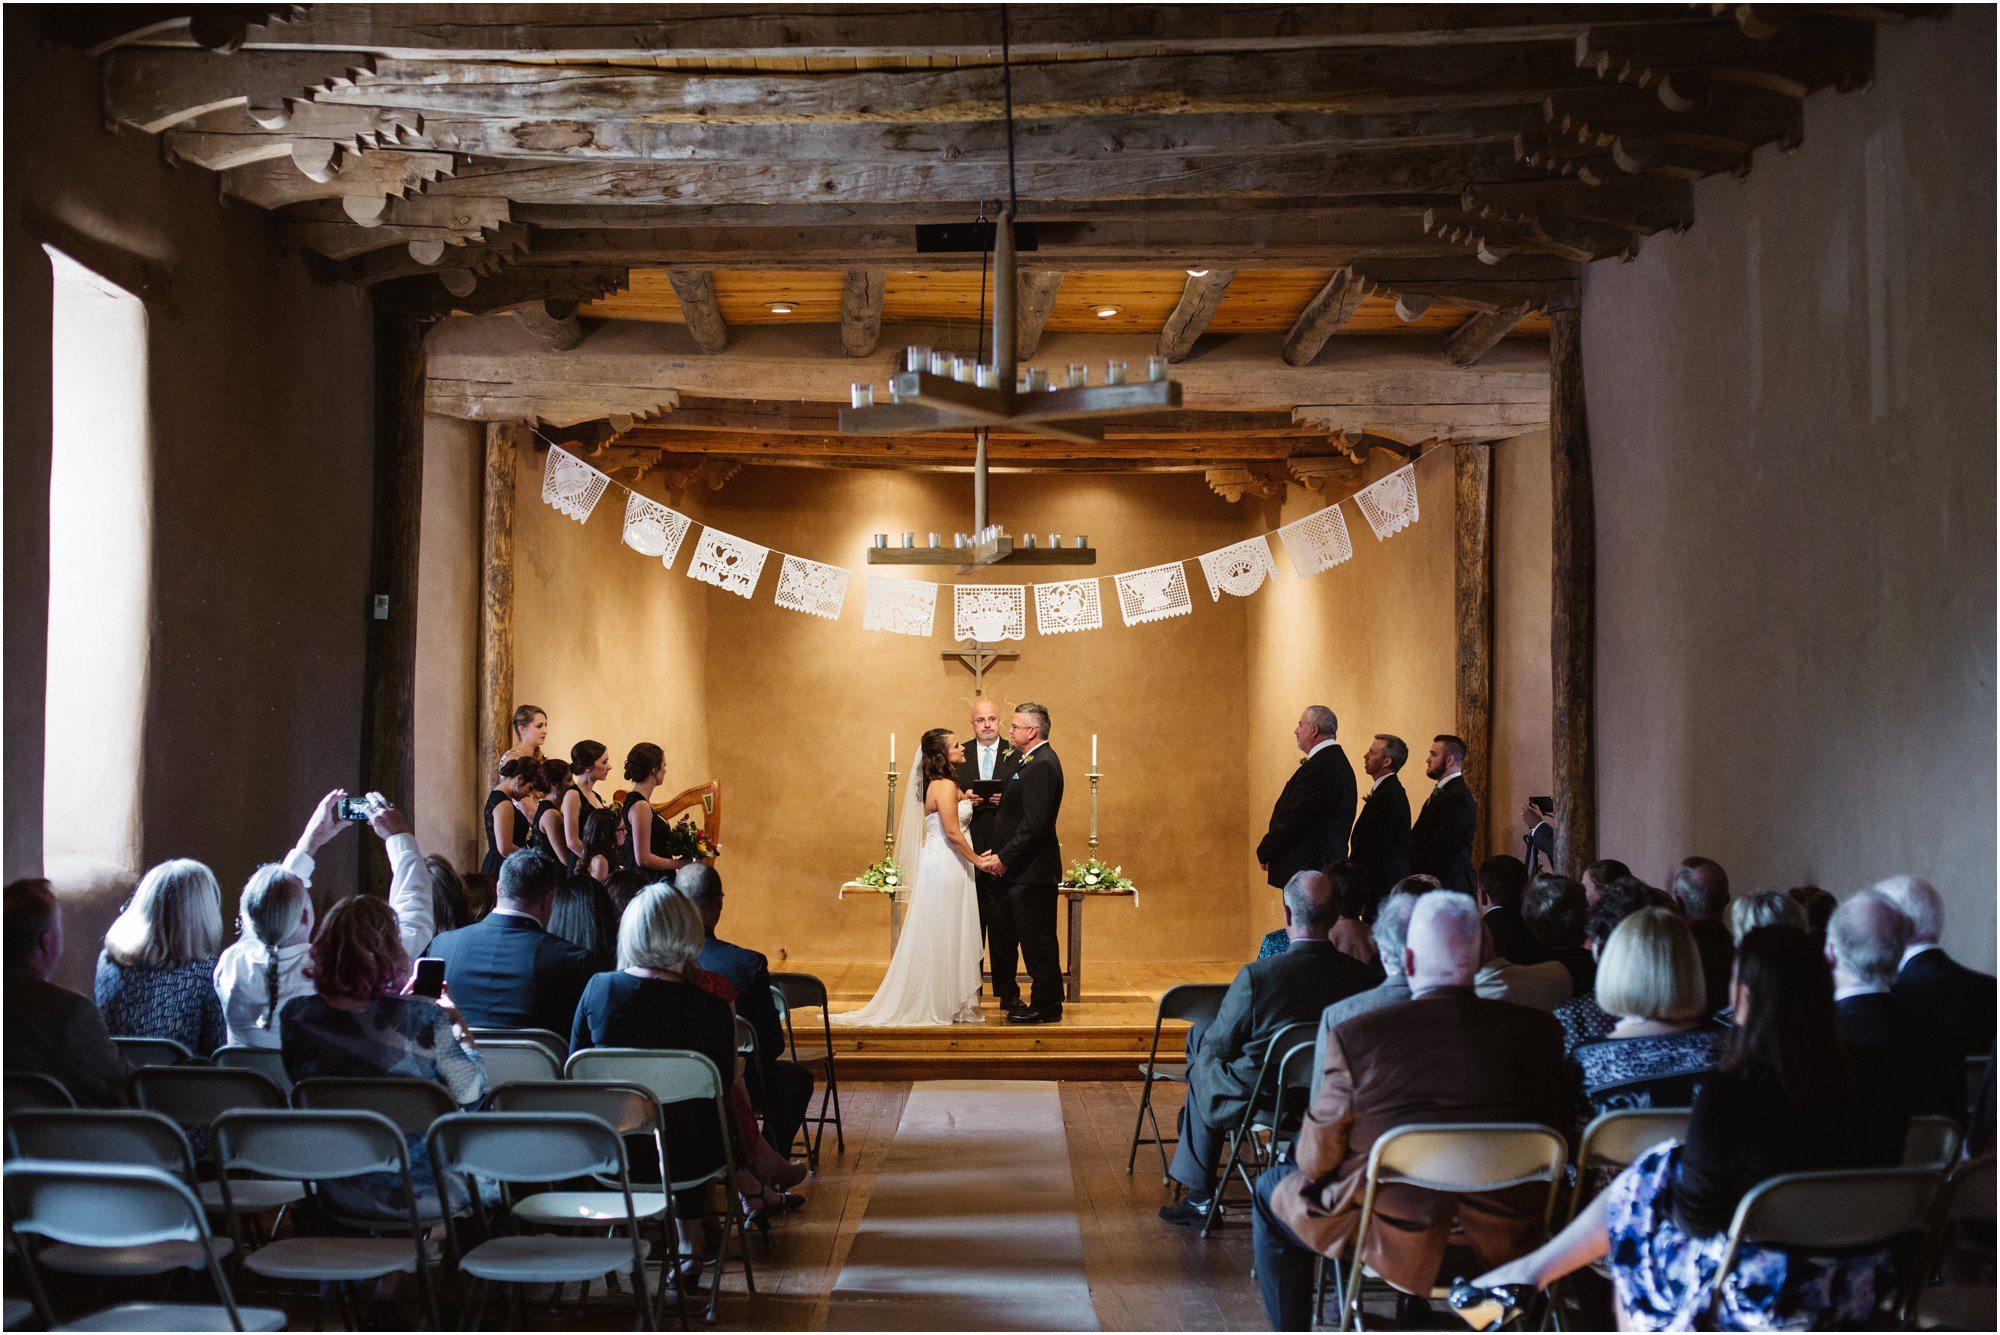 046BlueRosePhotography_ Albuquerque wedding photographers